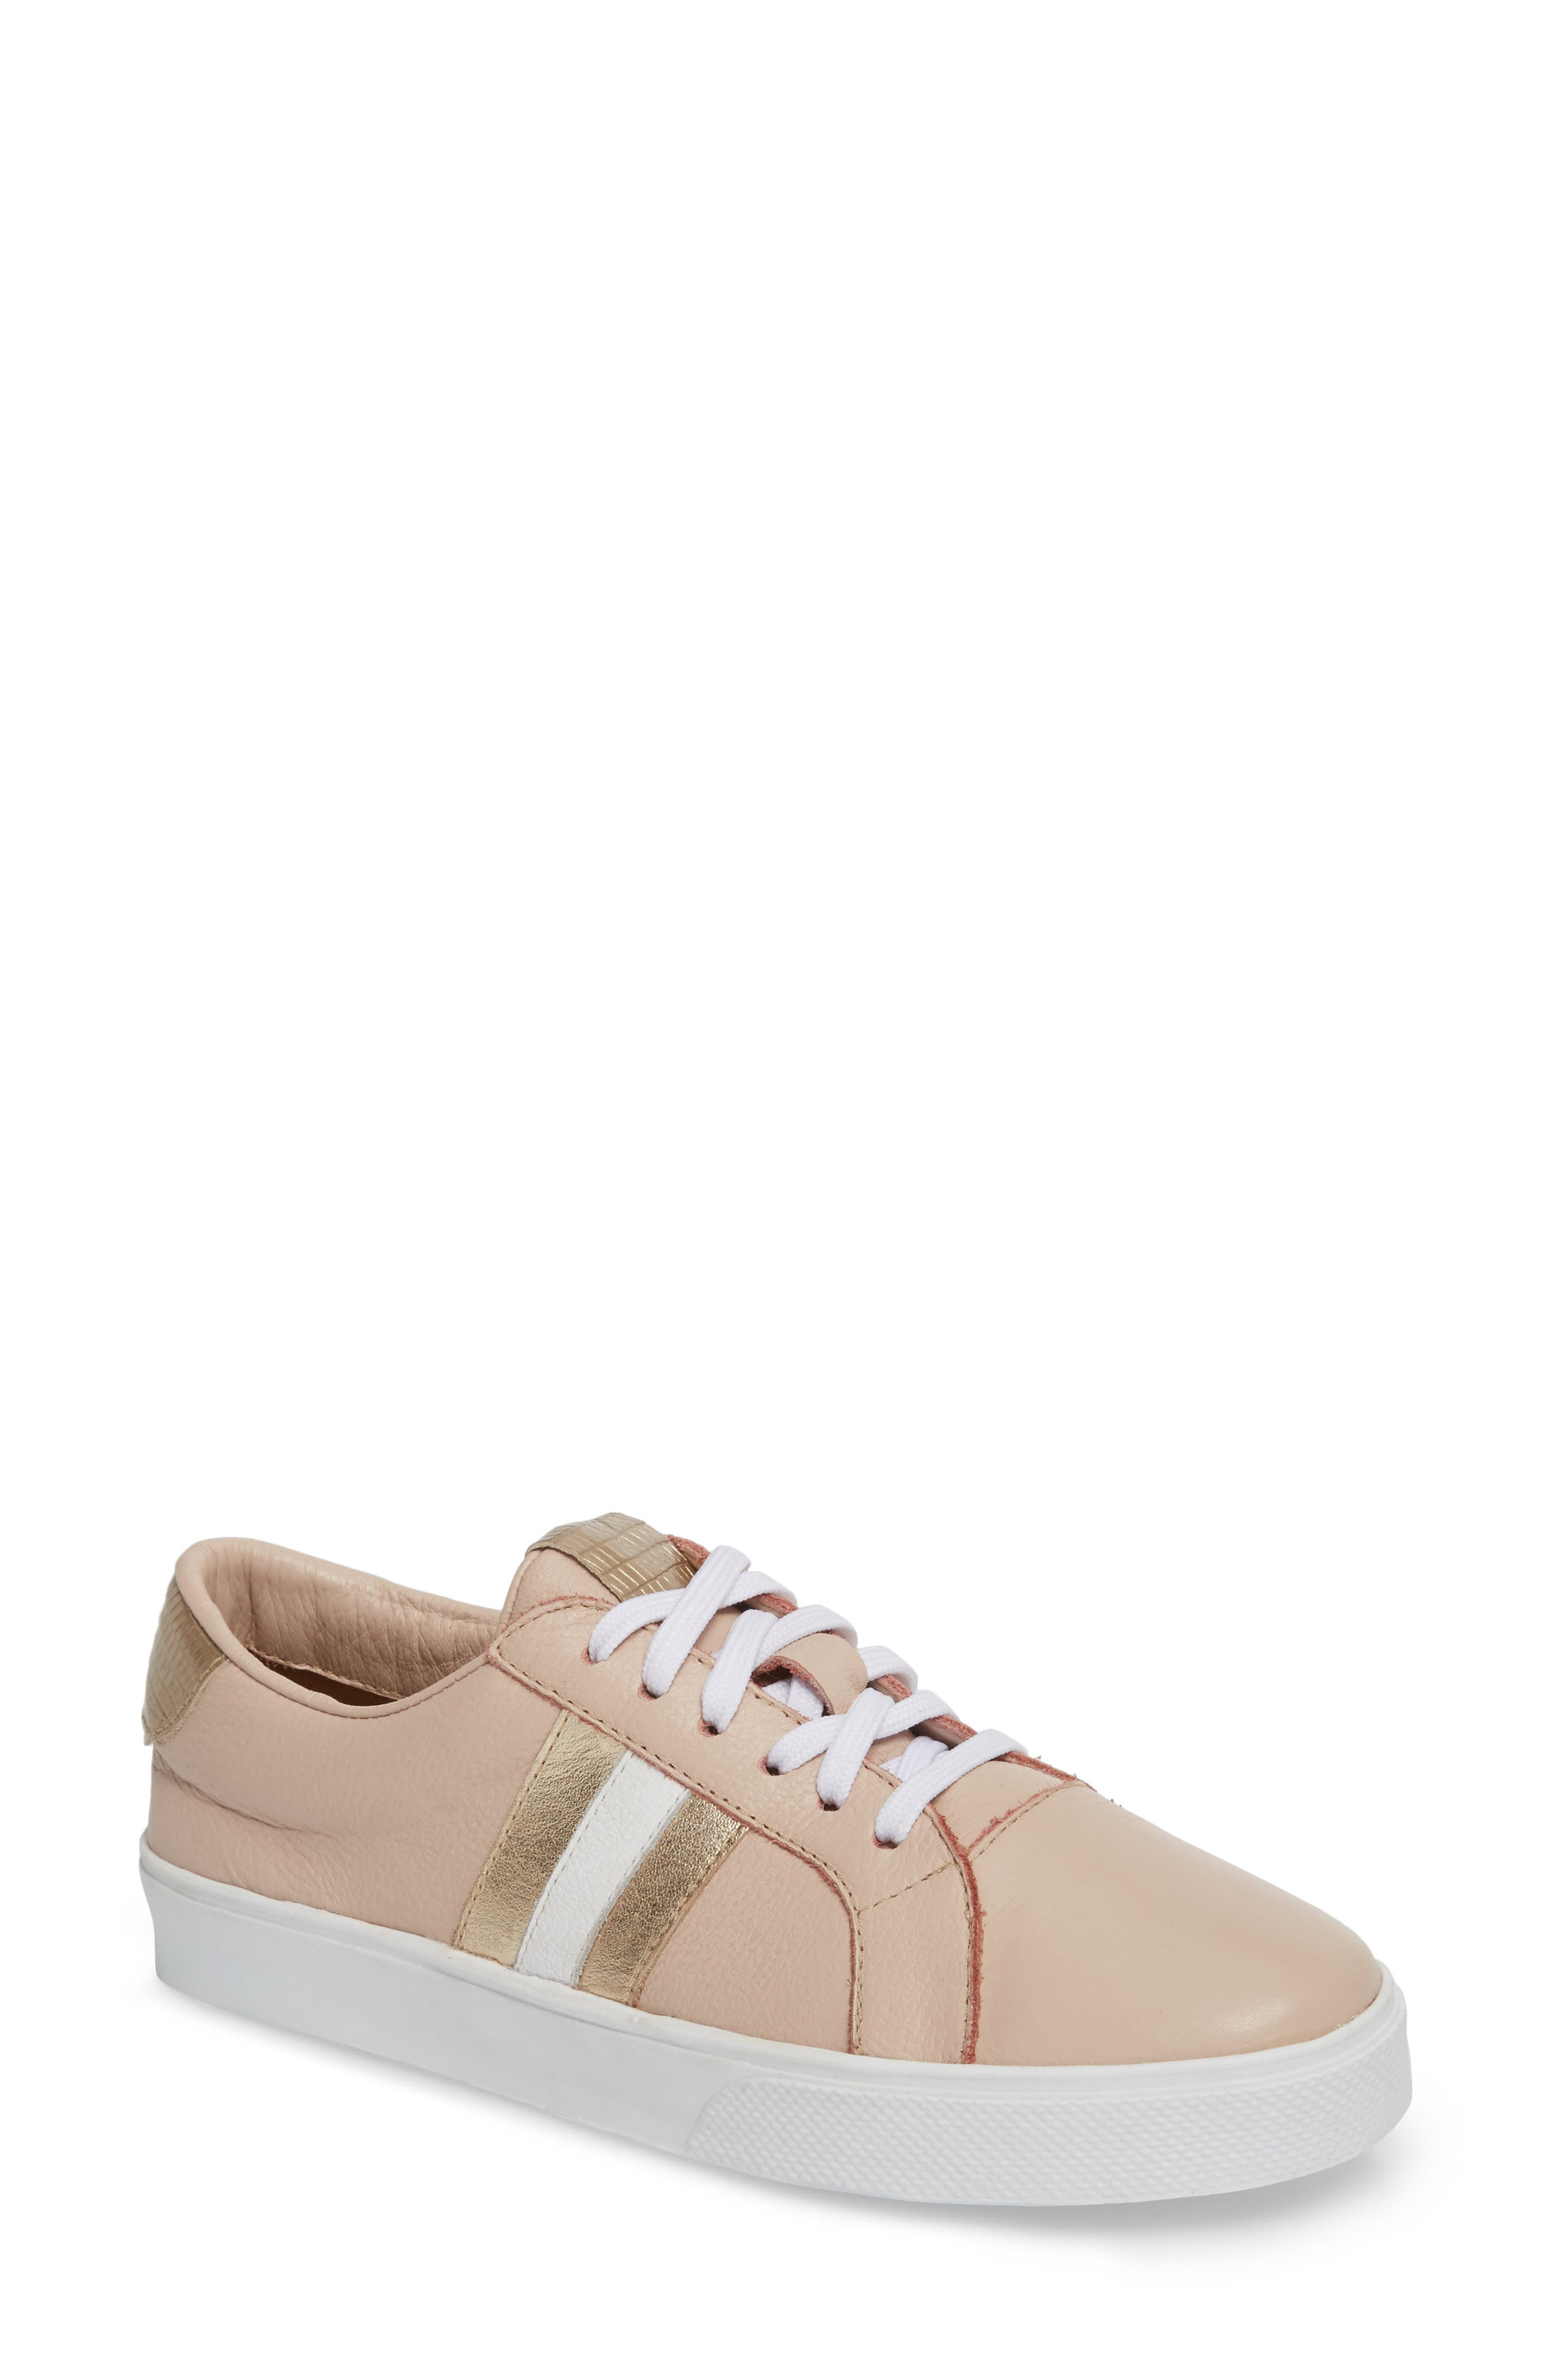 Tatacoa Low Top Sneaker,                             Main thumbnail 1, color,                             Blush